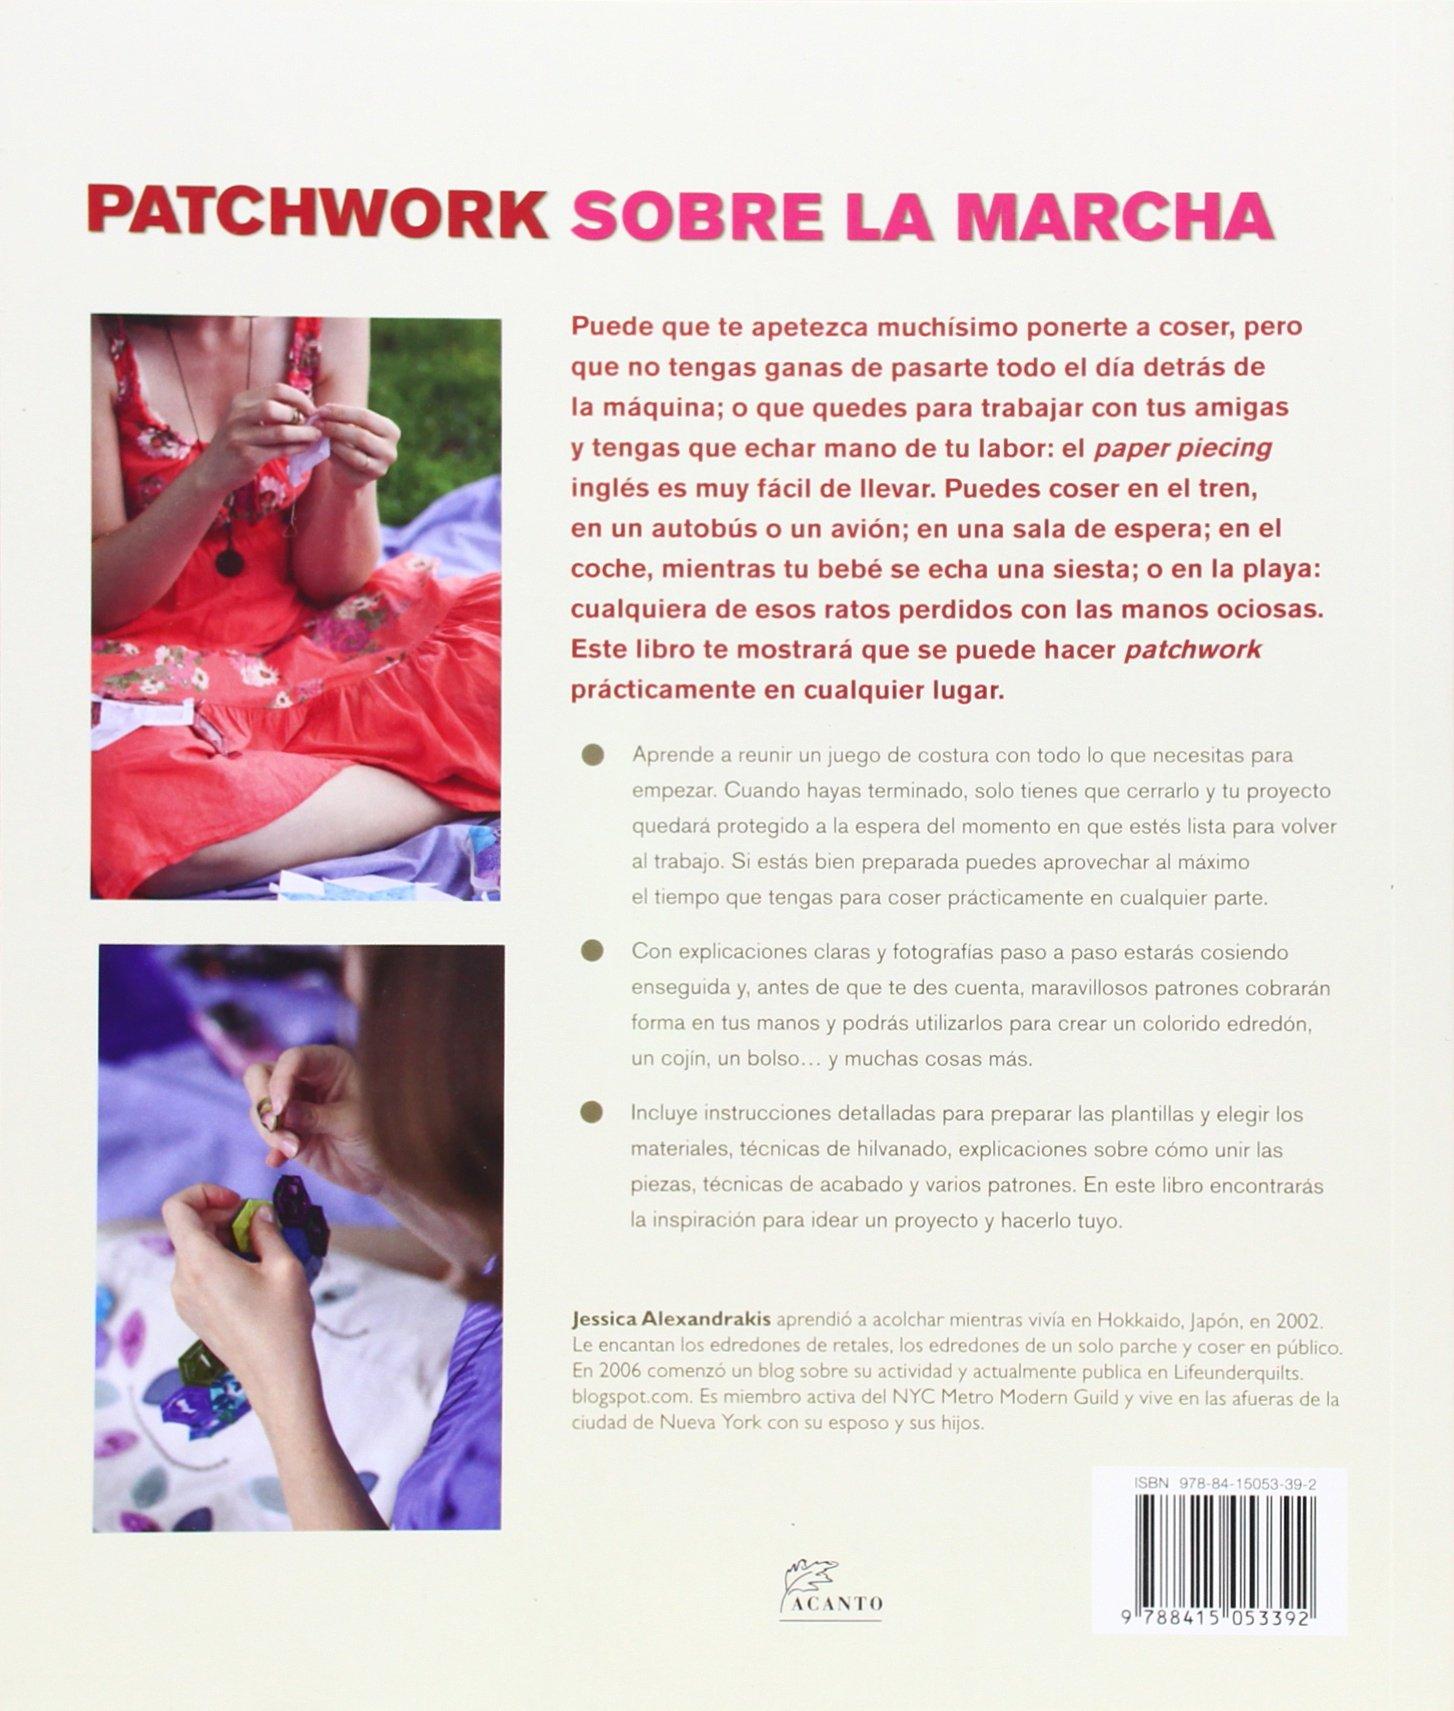 Patchwork sobre la marcha : labores de patchwork para llevar ...